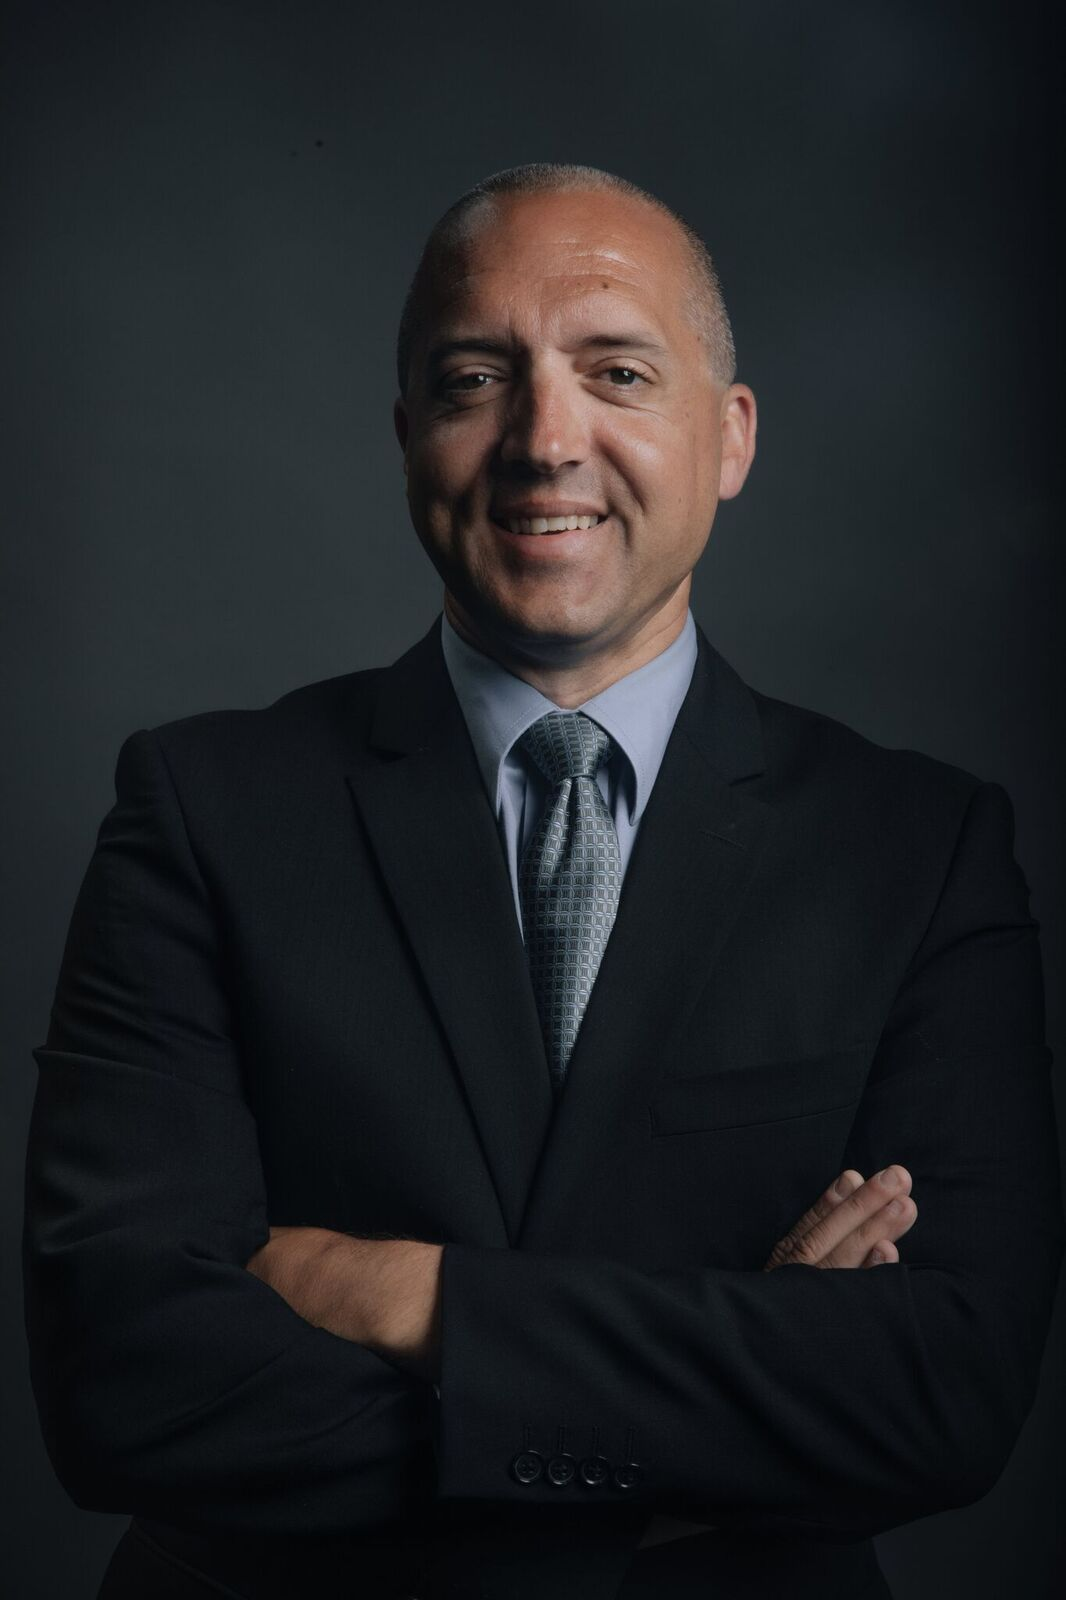 Darren Domshy Insurance Professional